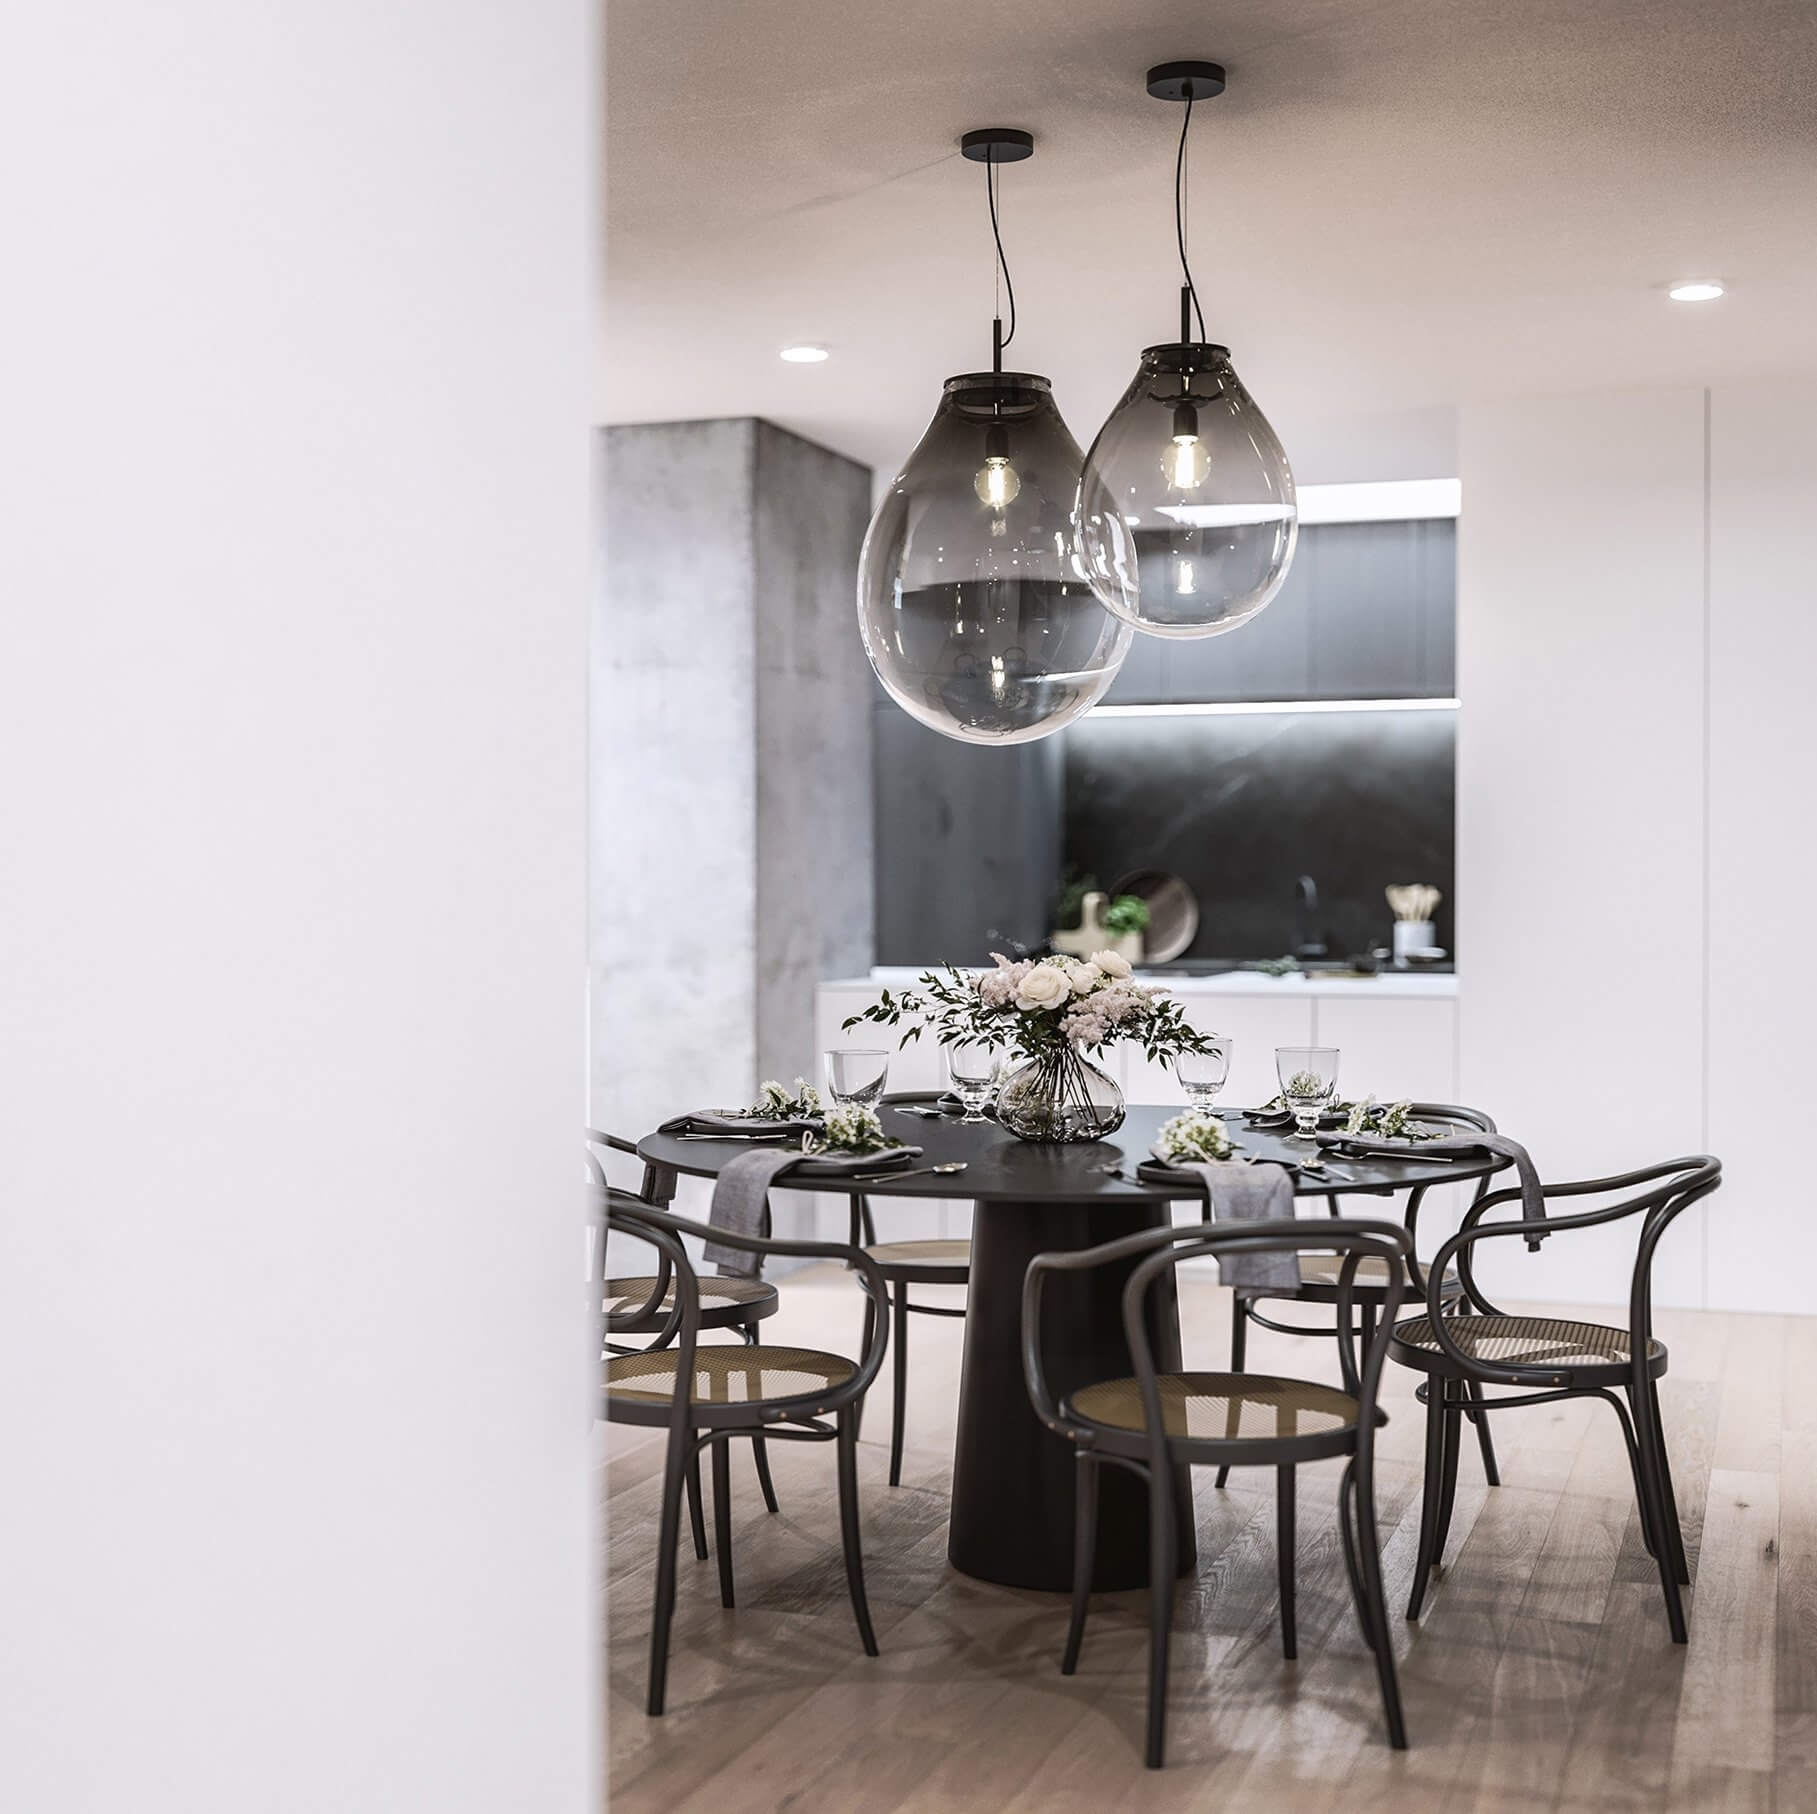 Mánesova Designer Apartment classic dinning room glass bulp pendant lamps - cgi visualization